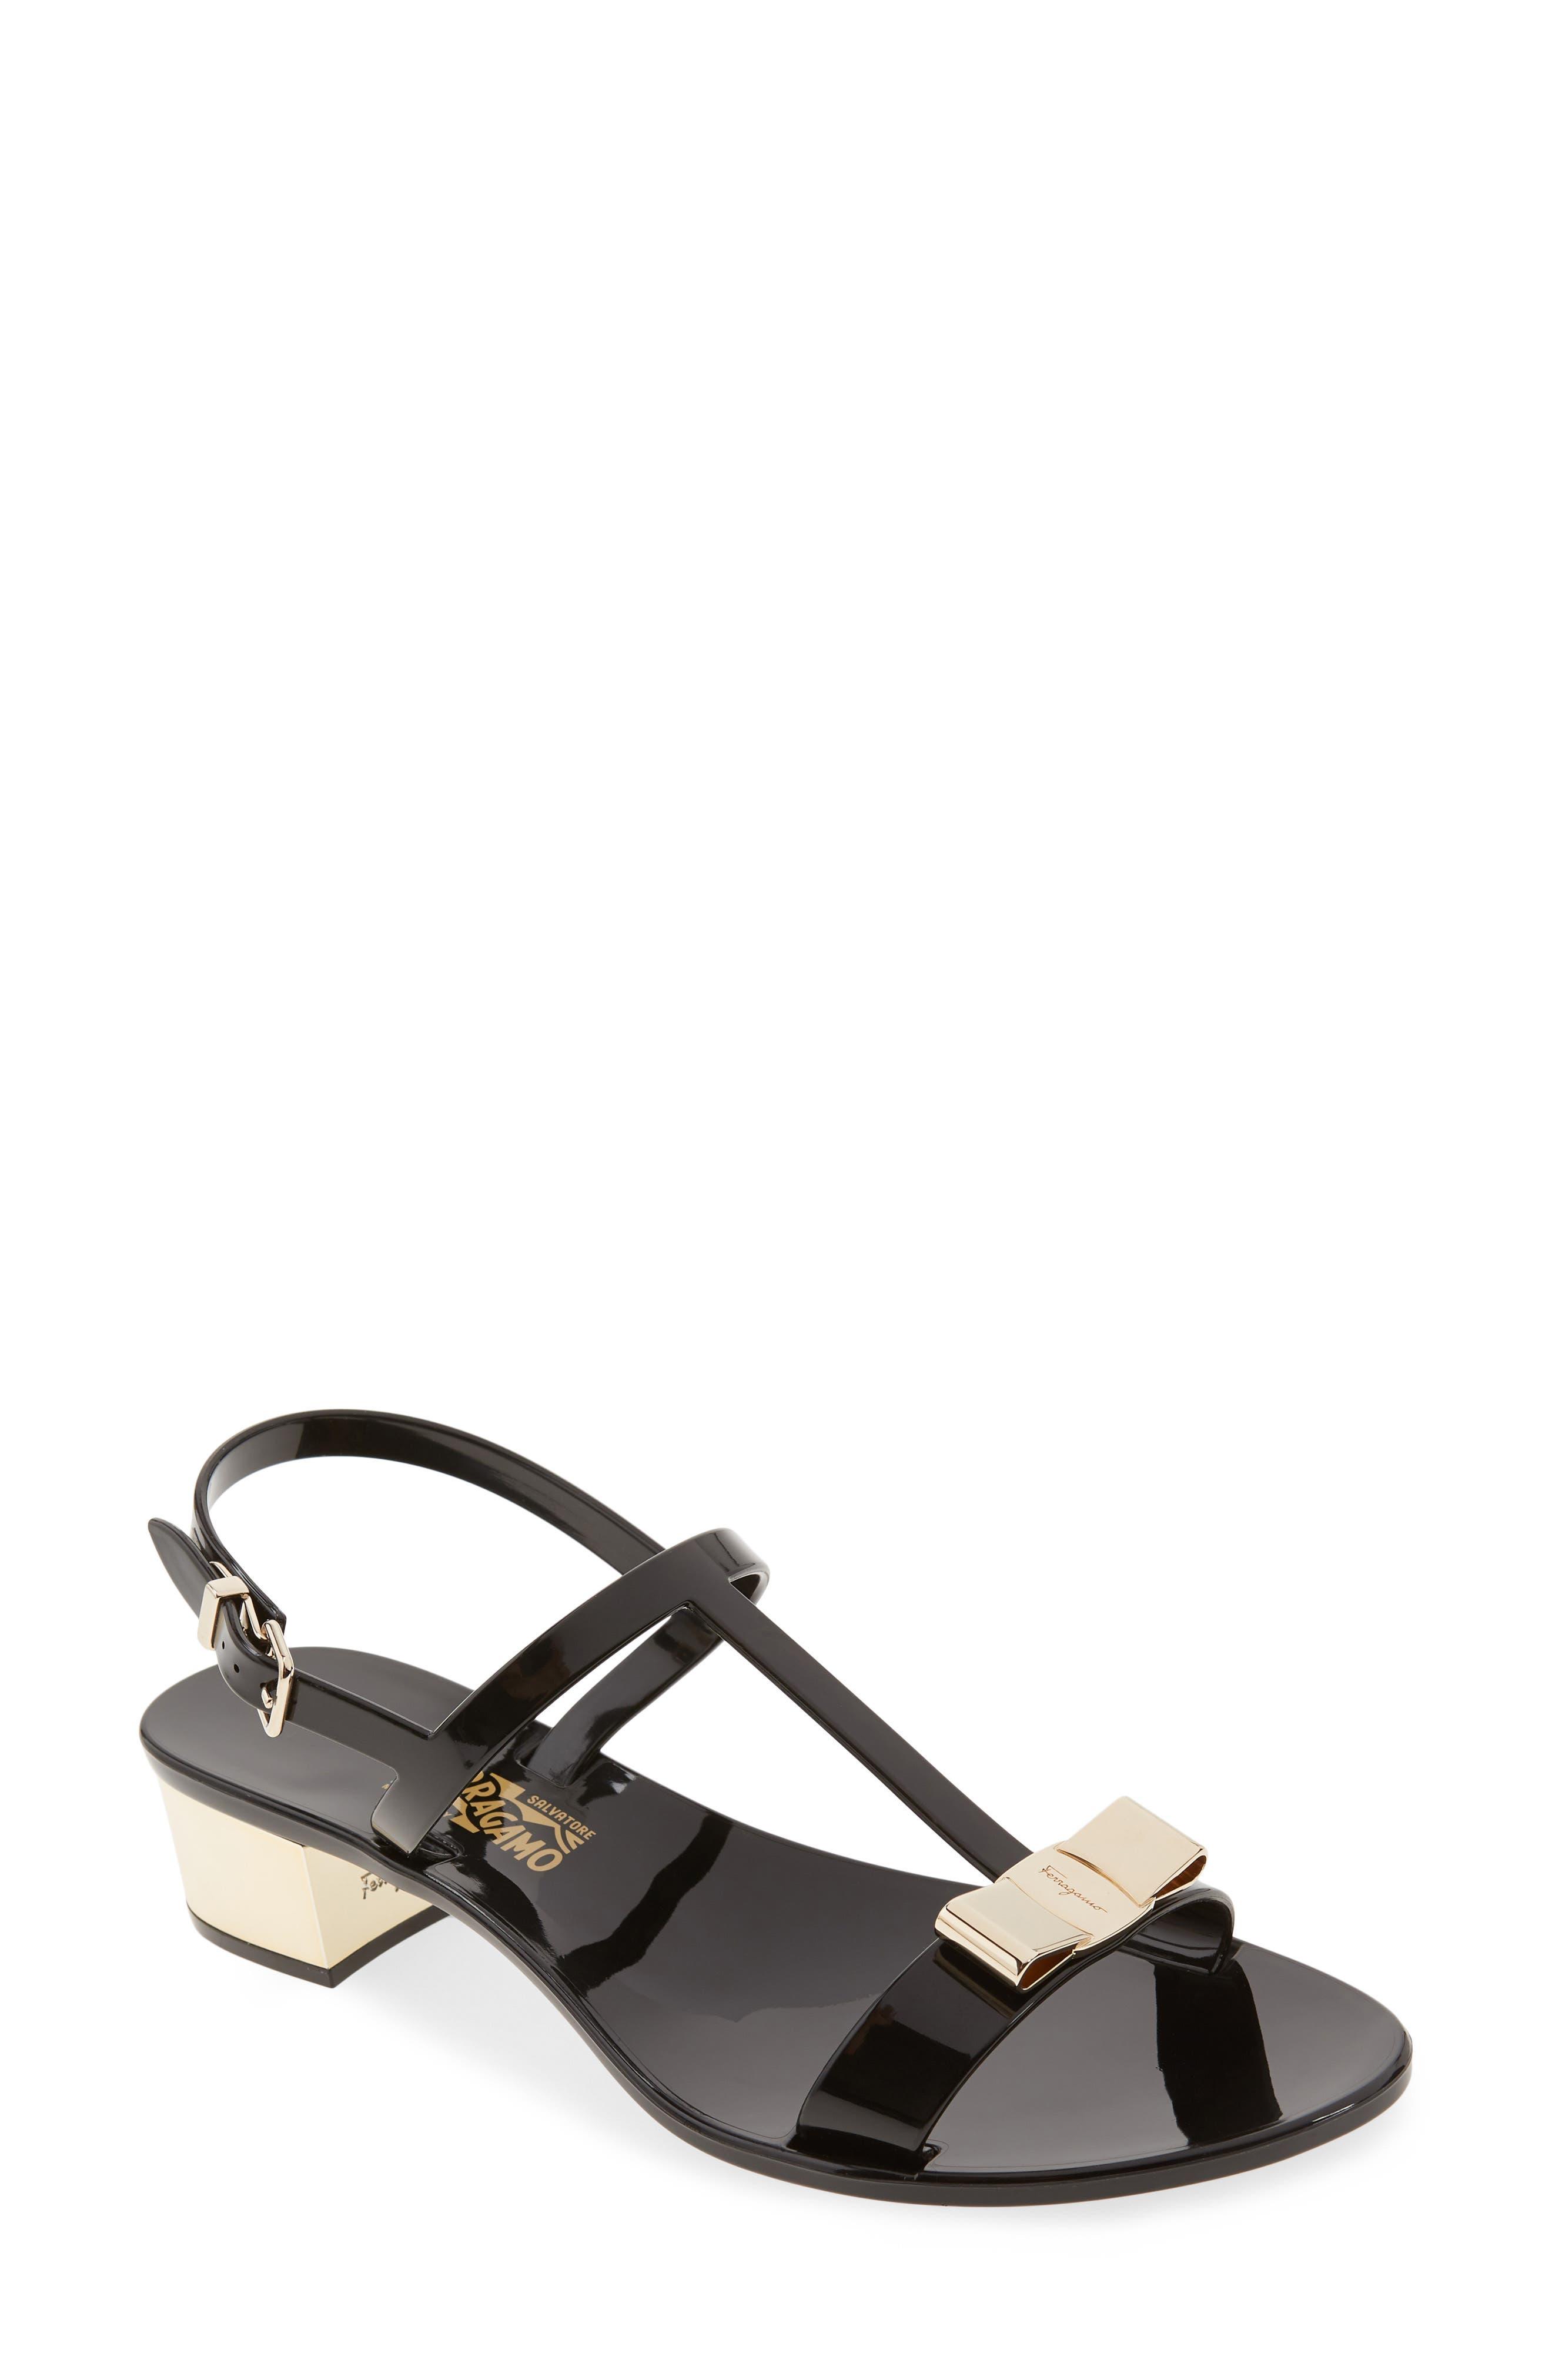 Favilia Jelly Sandal,                         Main,                         color, Black